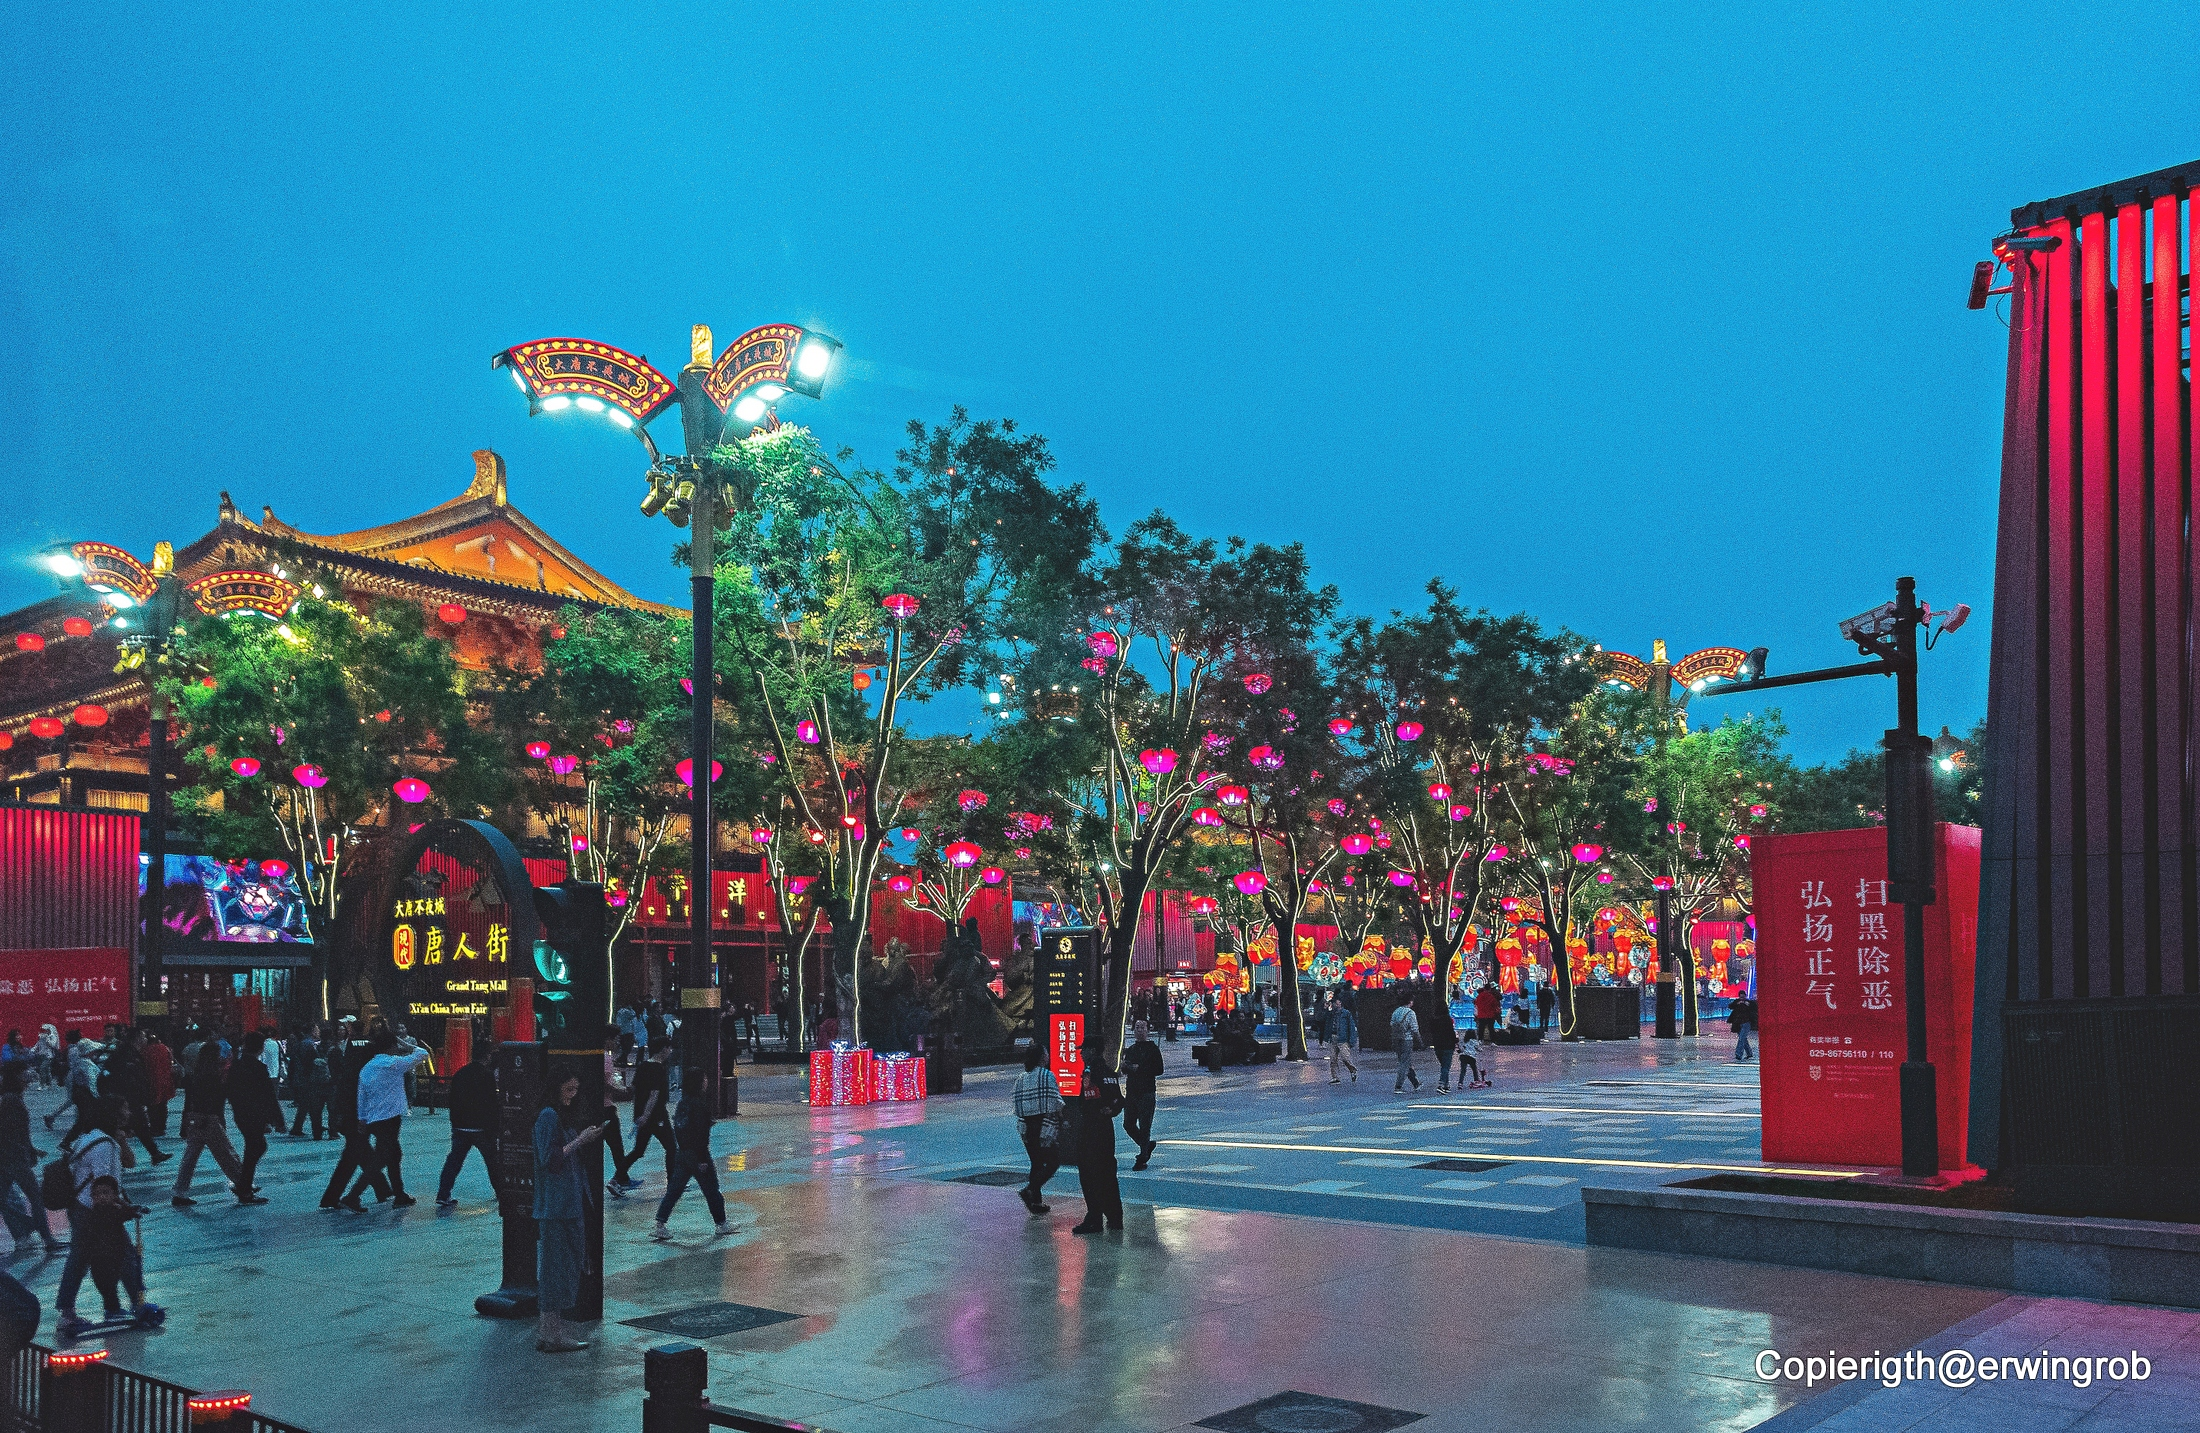 Vergnügungsstrasse in Xian